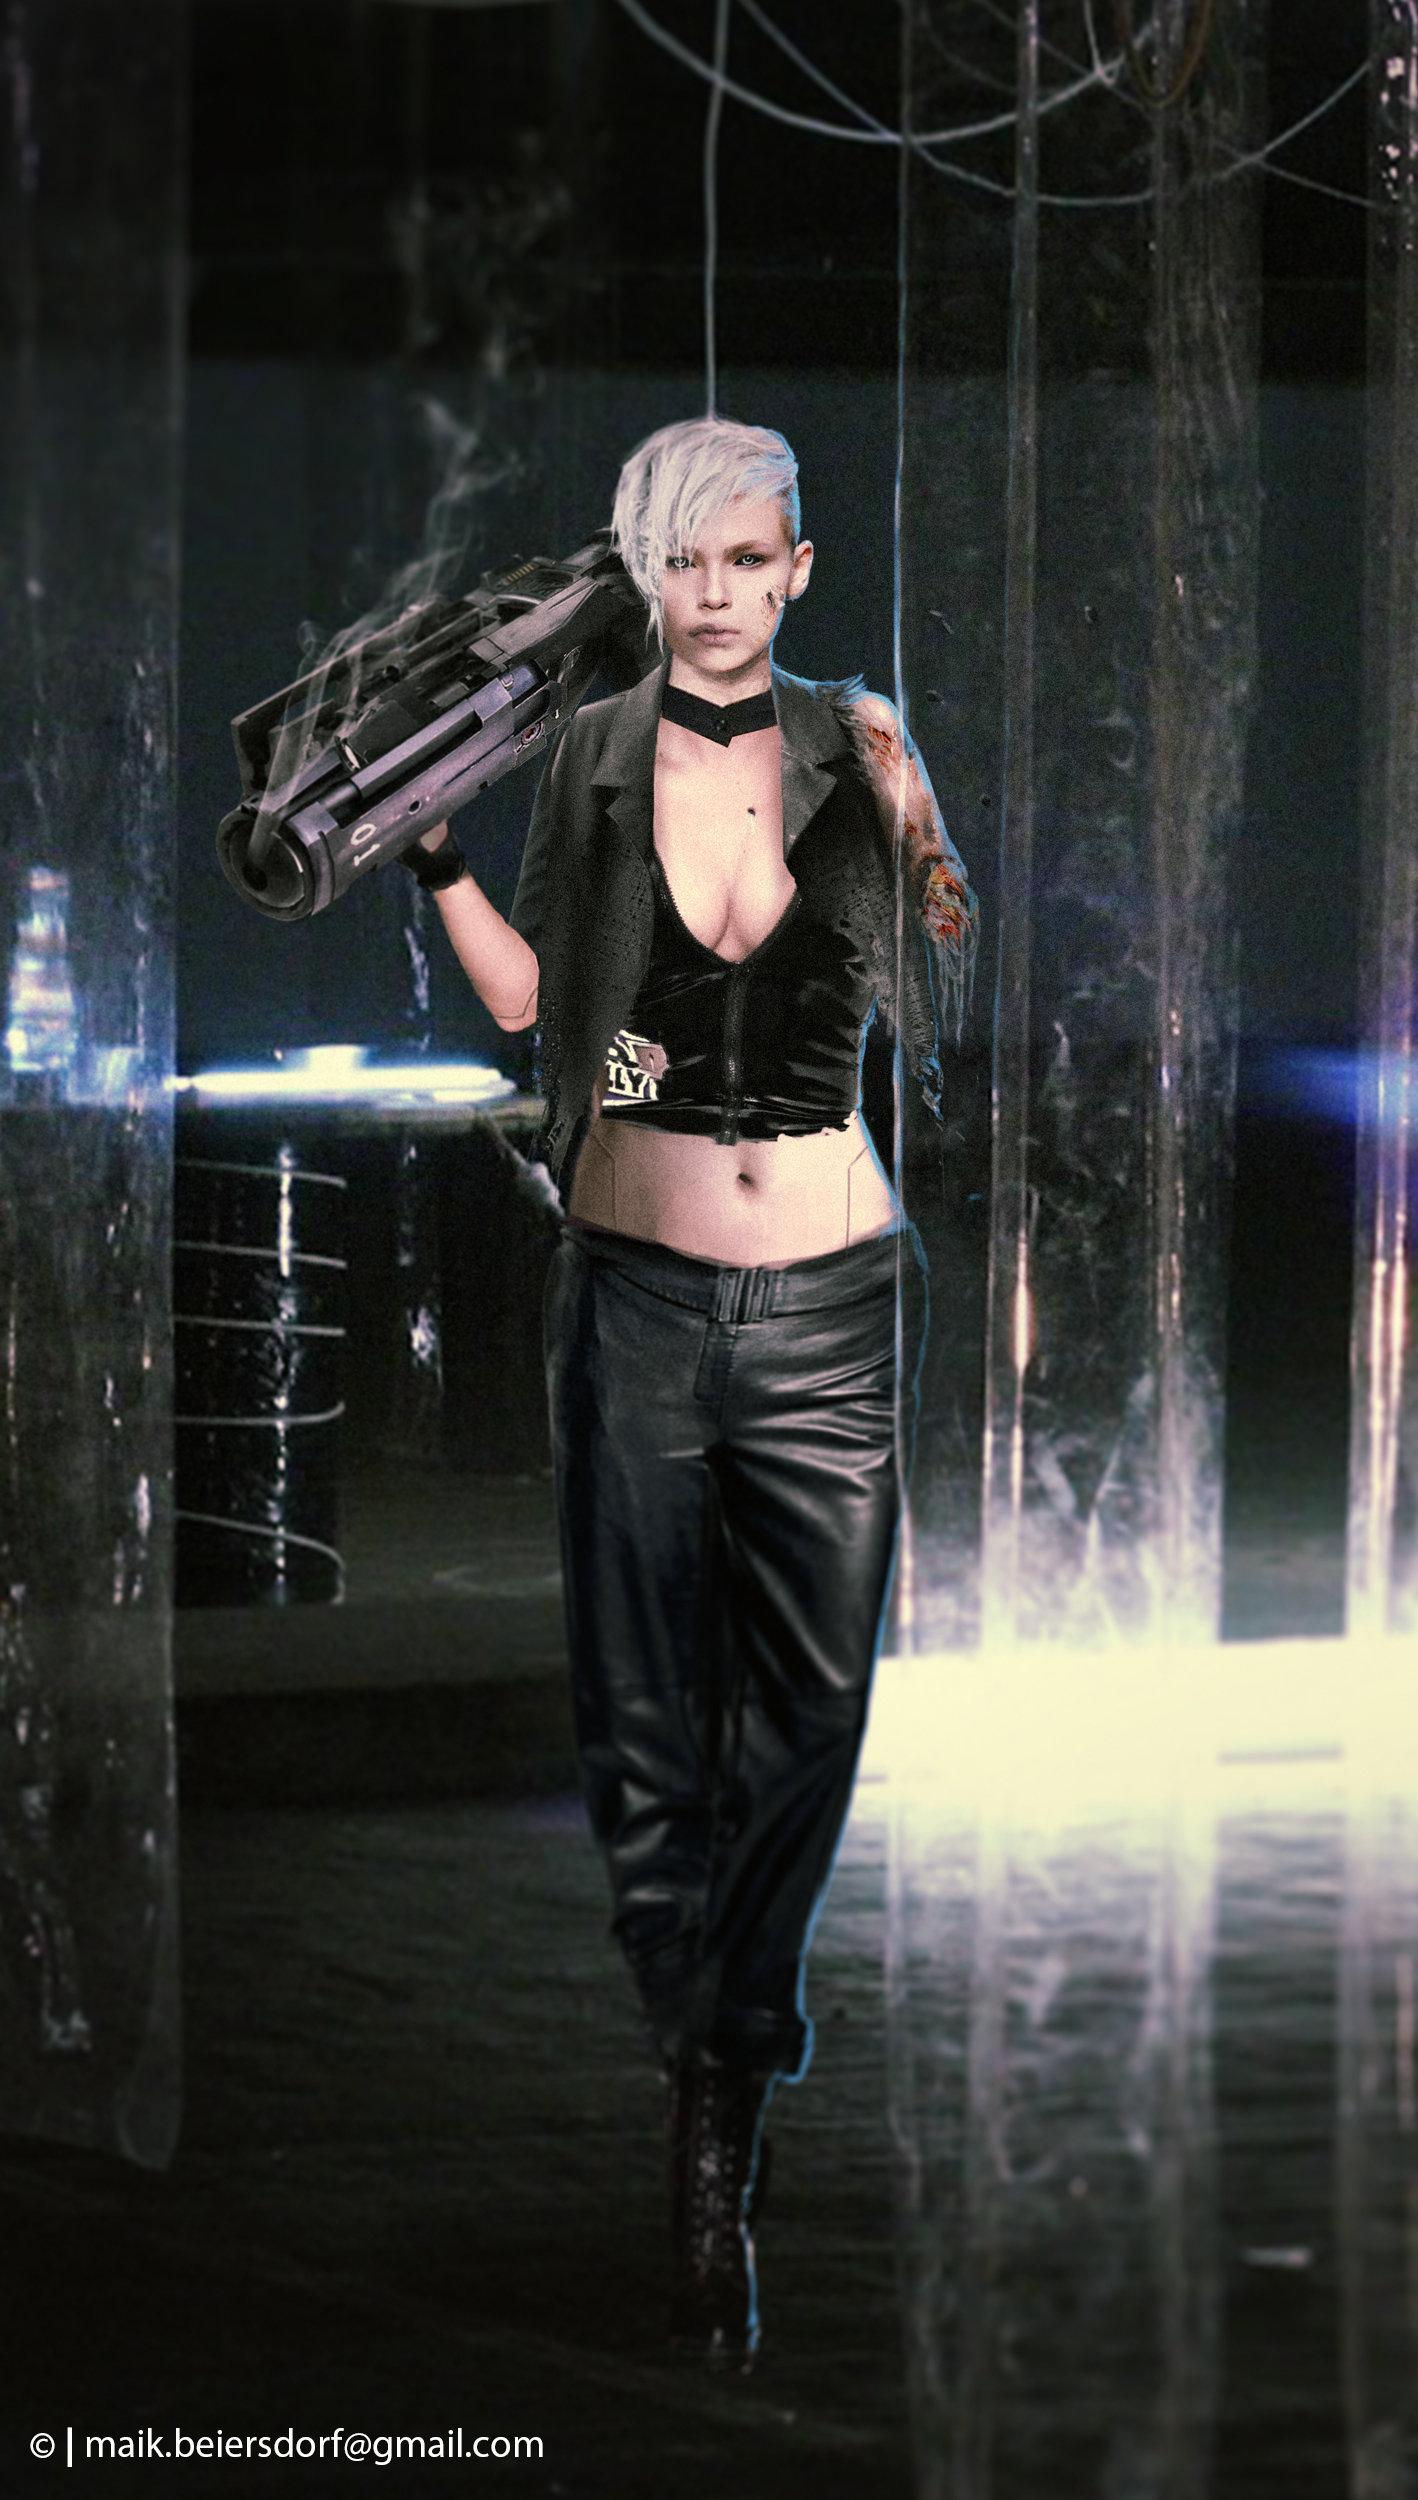 Maik beiersdorf cyborg full